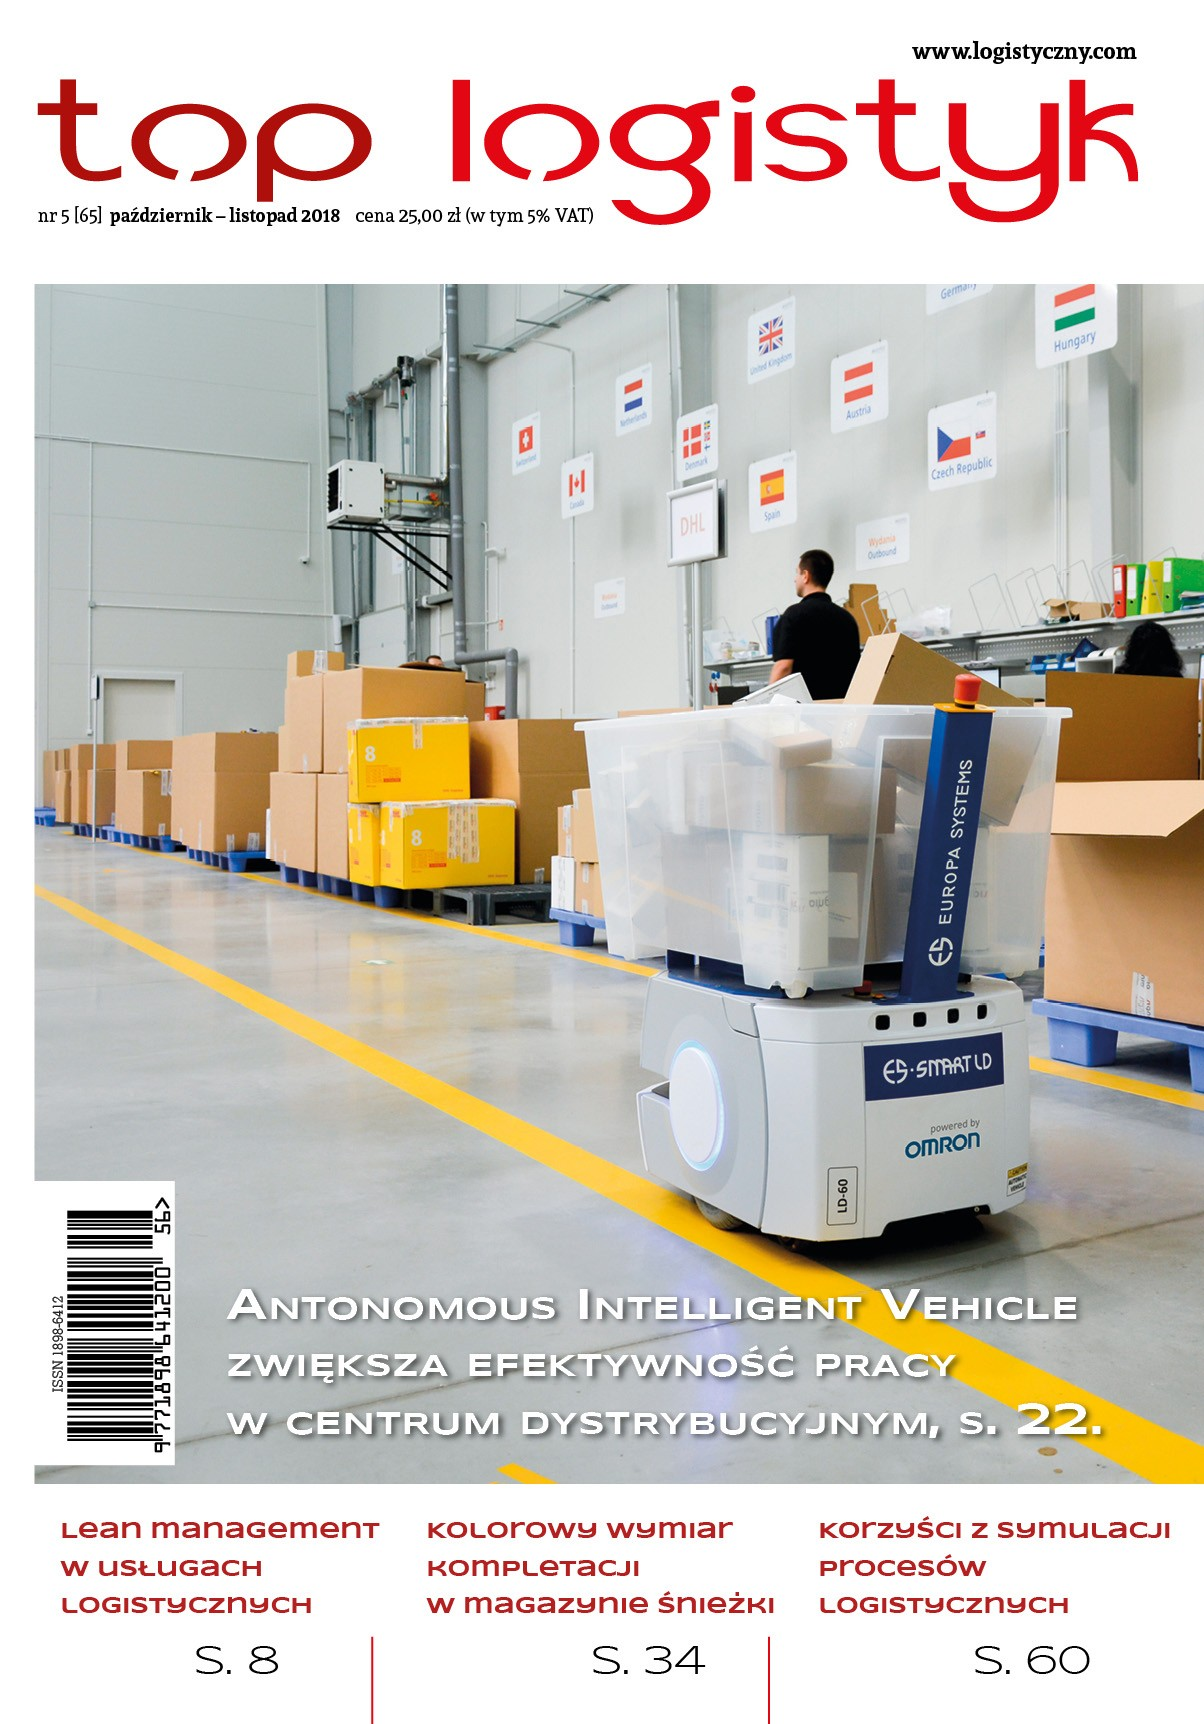 Top Logistyk 5/2018-e-wydanie